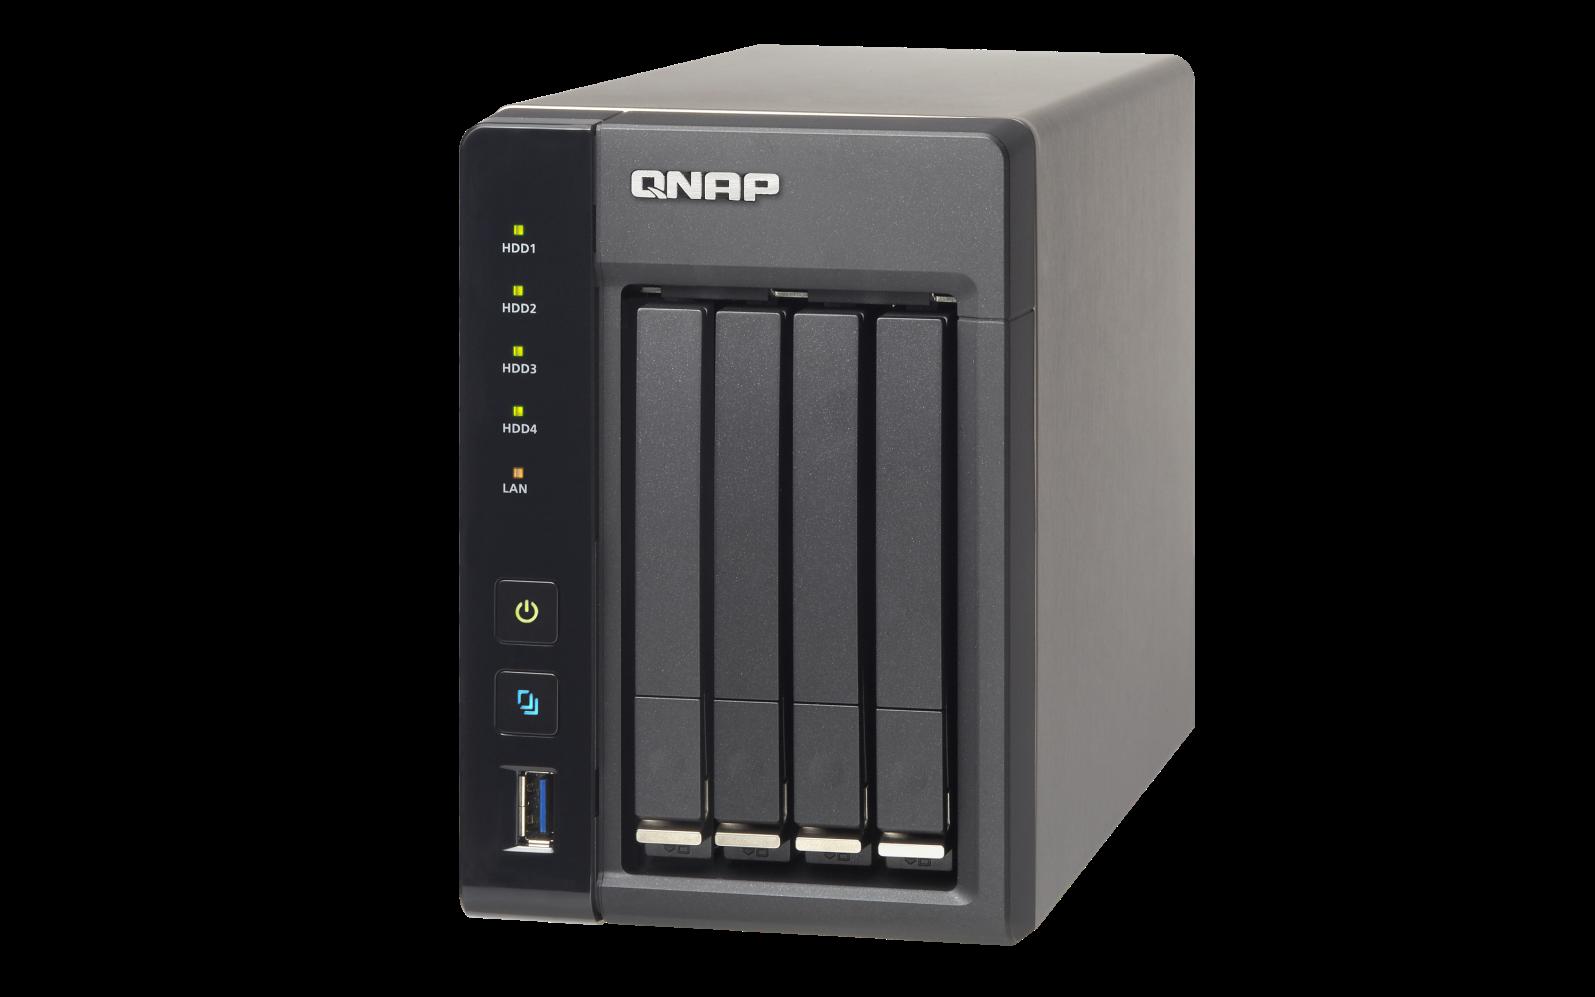 QNAP TS-453S-Pro (2,4G/4GB RAM/4xSATA)